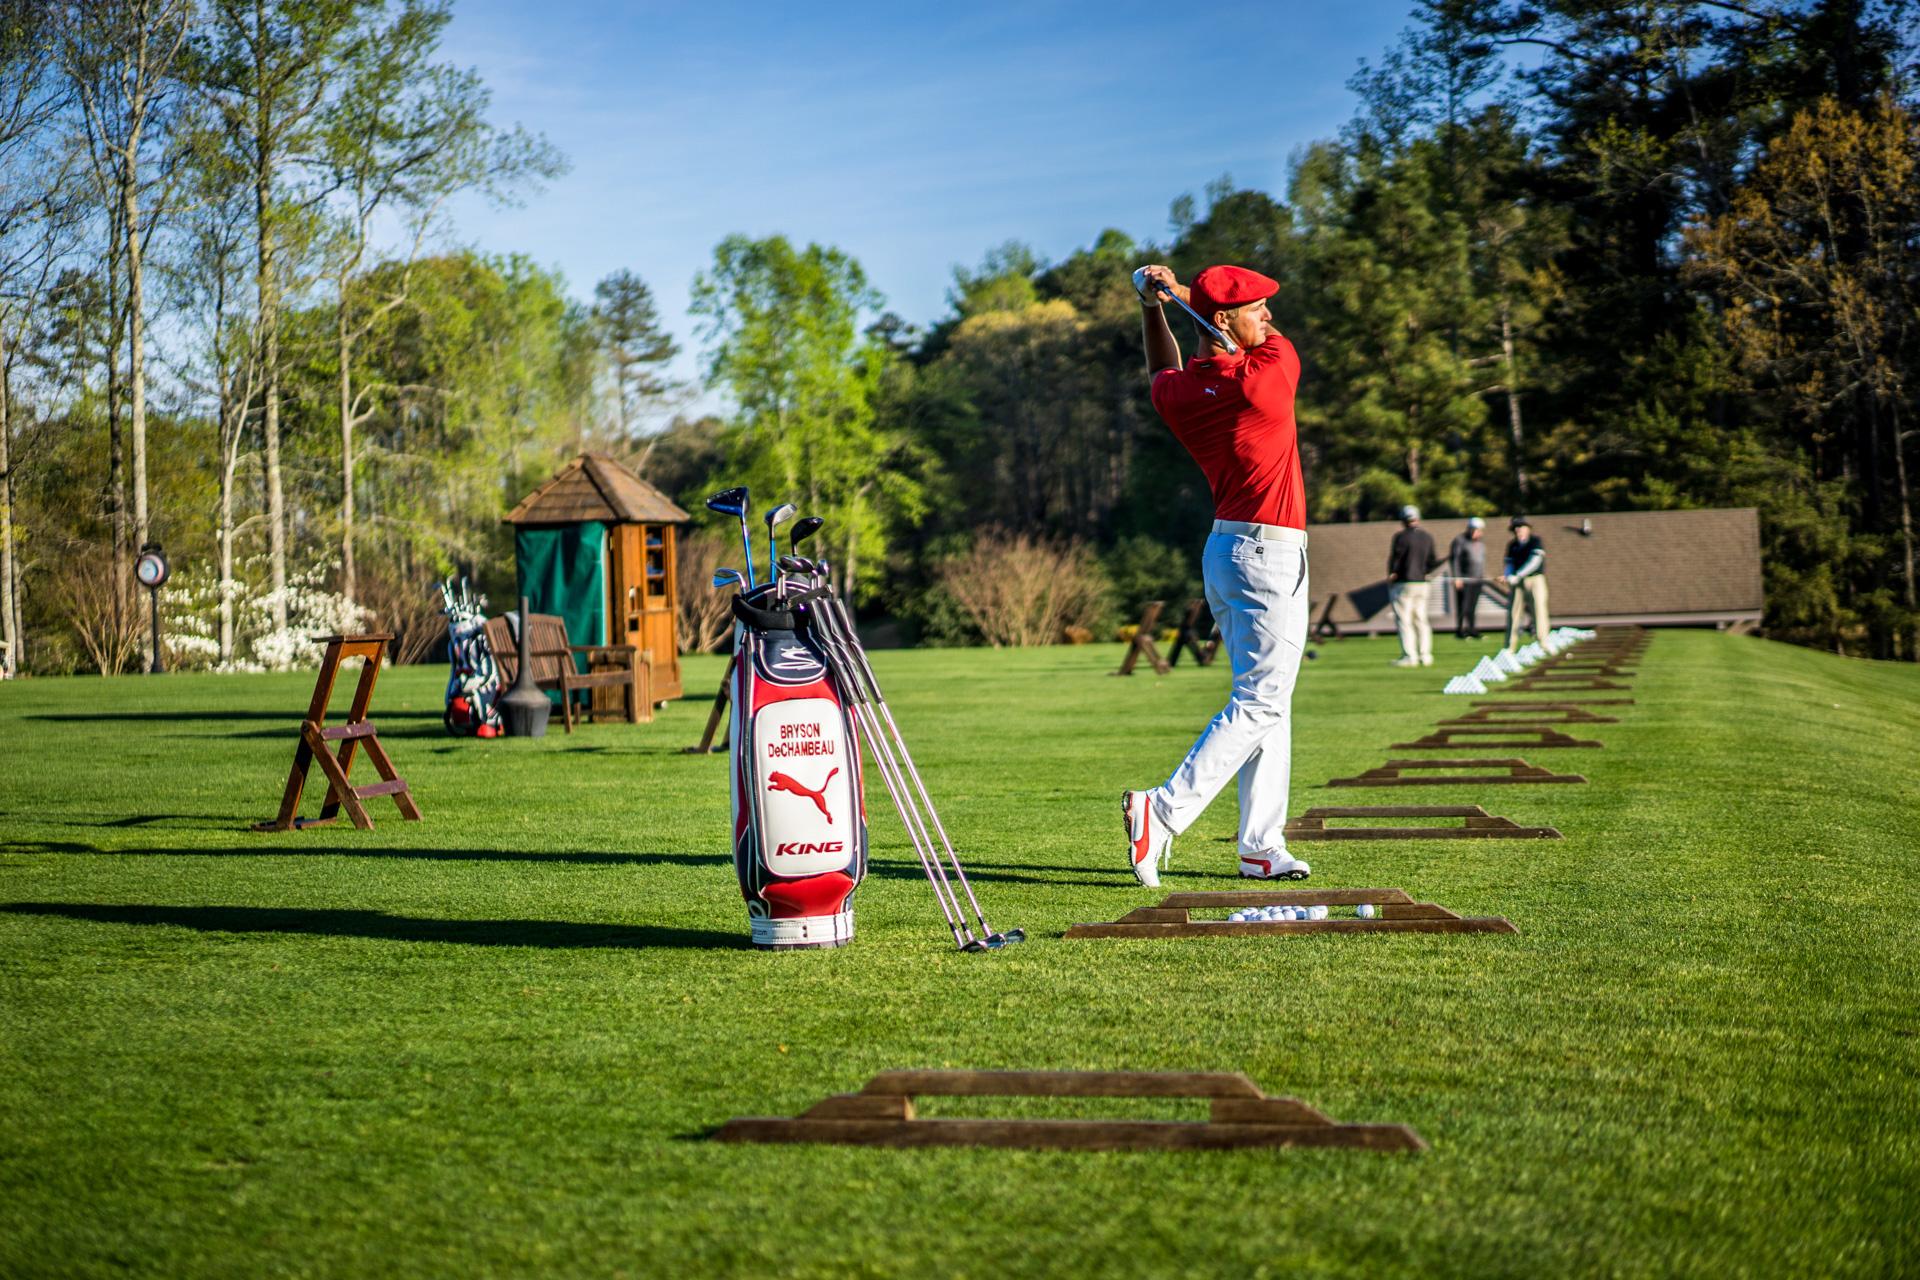 Bridgestone Golf Bryson DeChambeau Driving Range